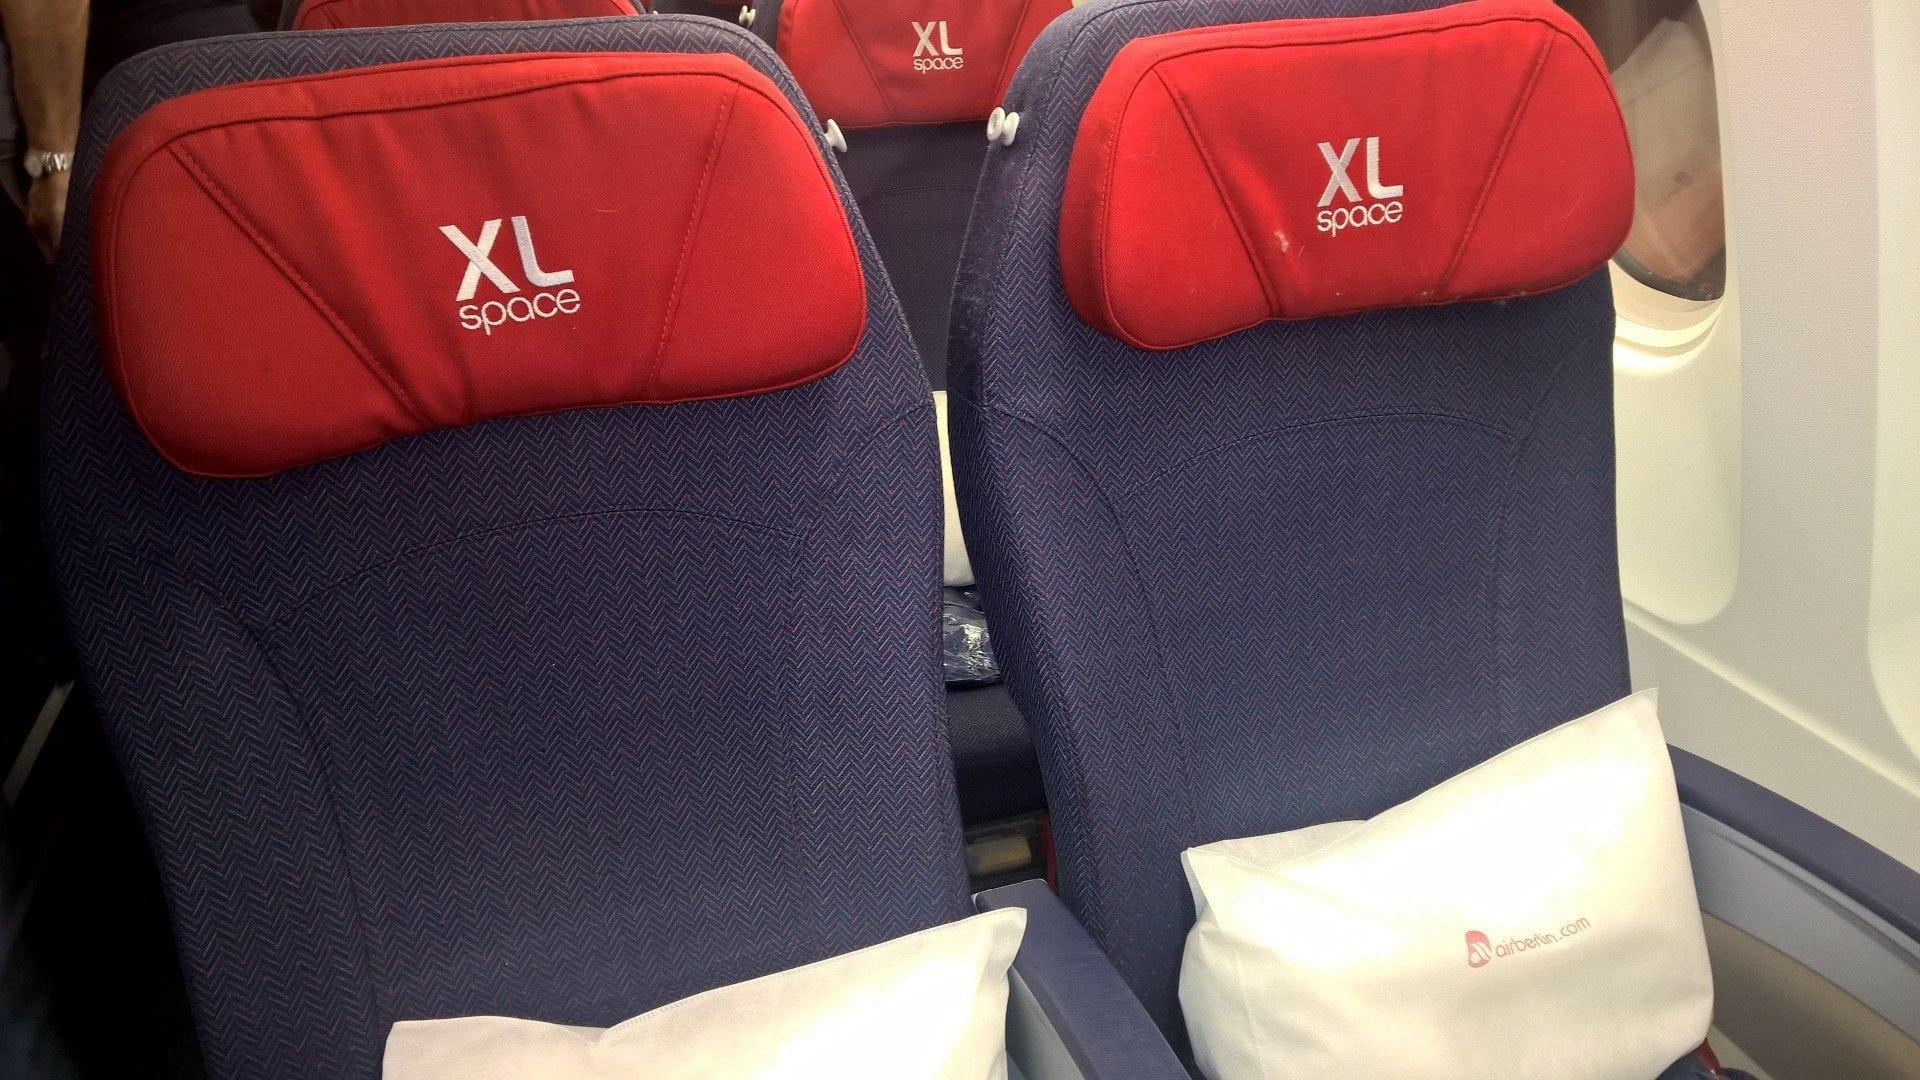 airberlin Economy Class XL Seats